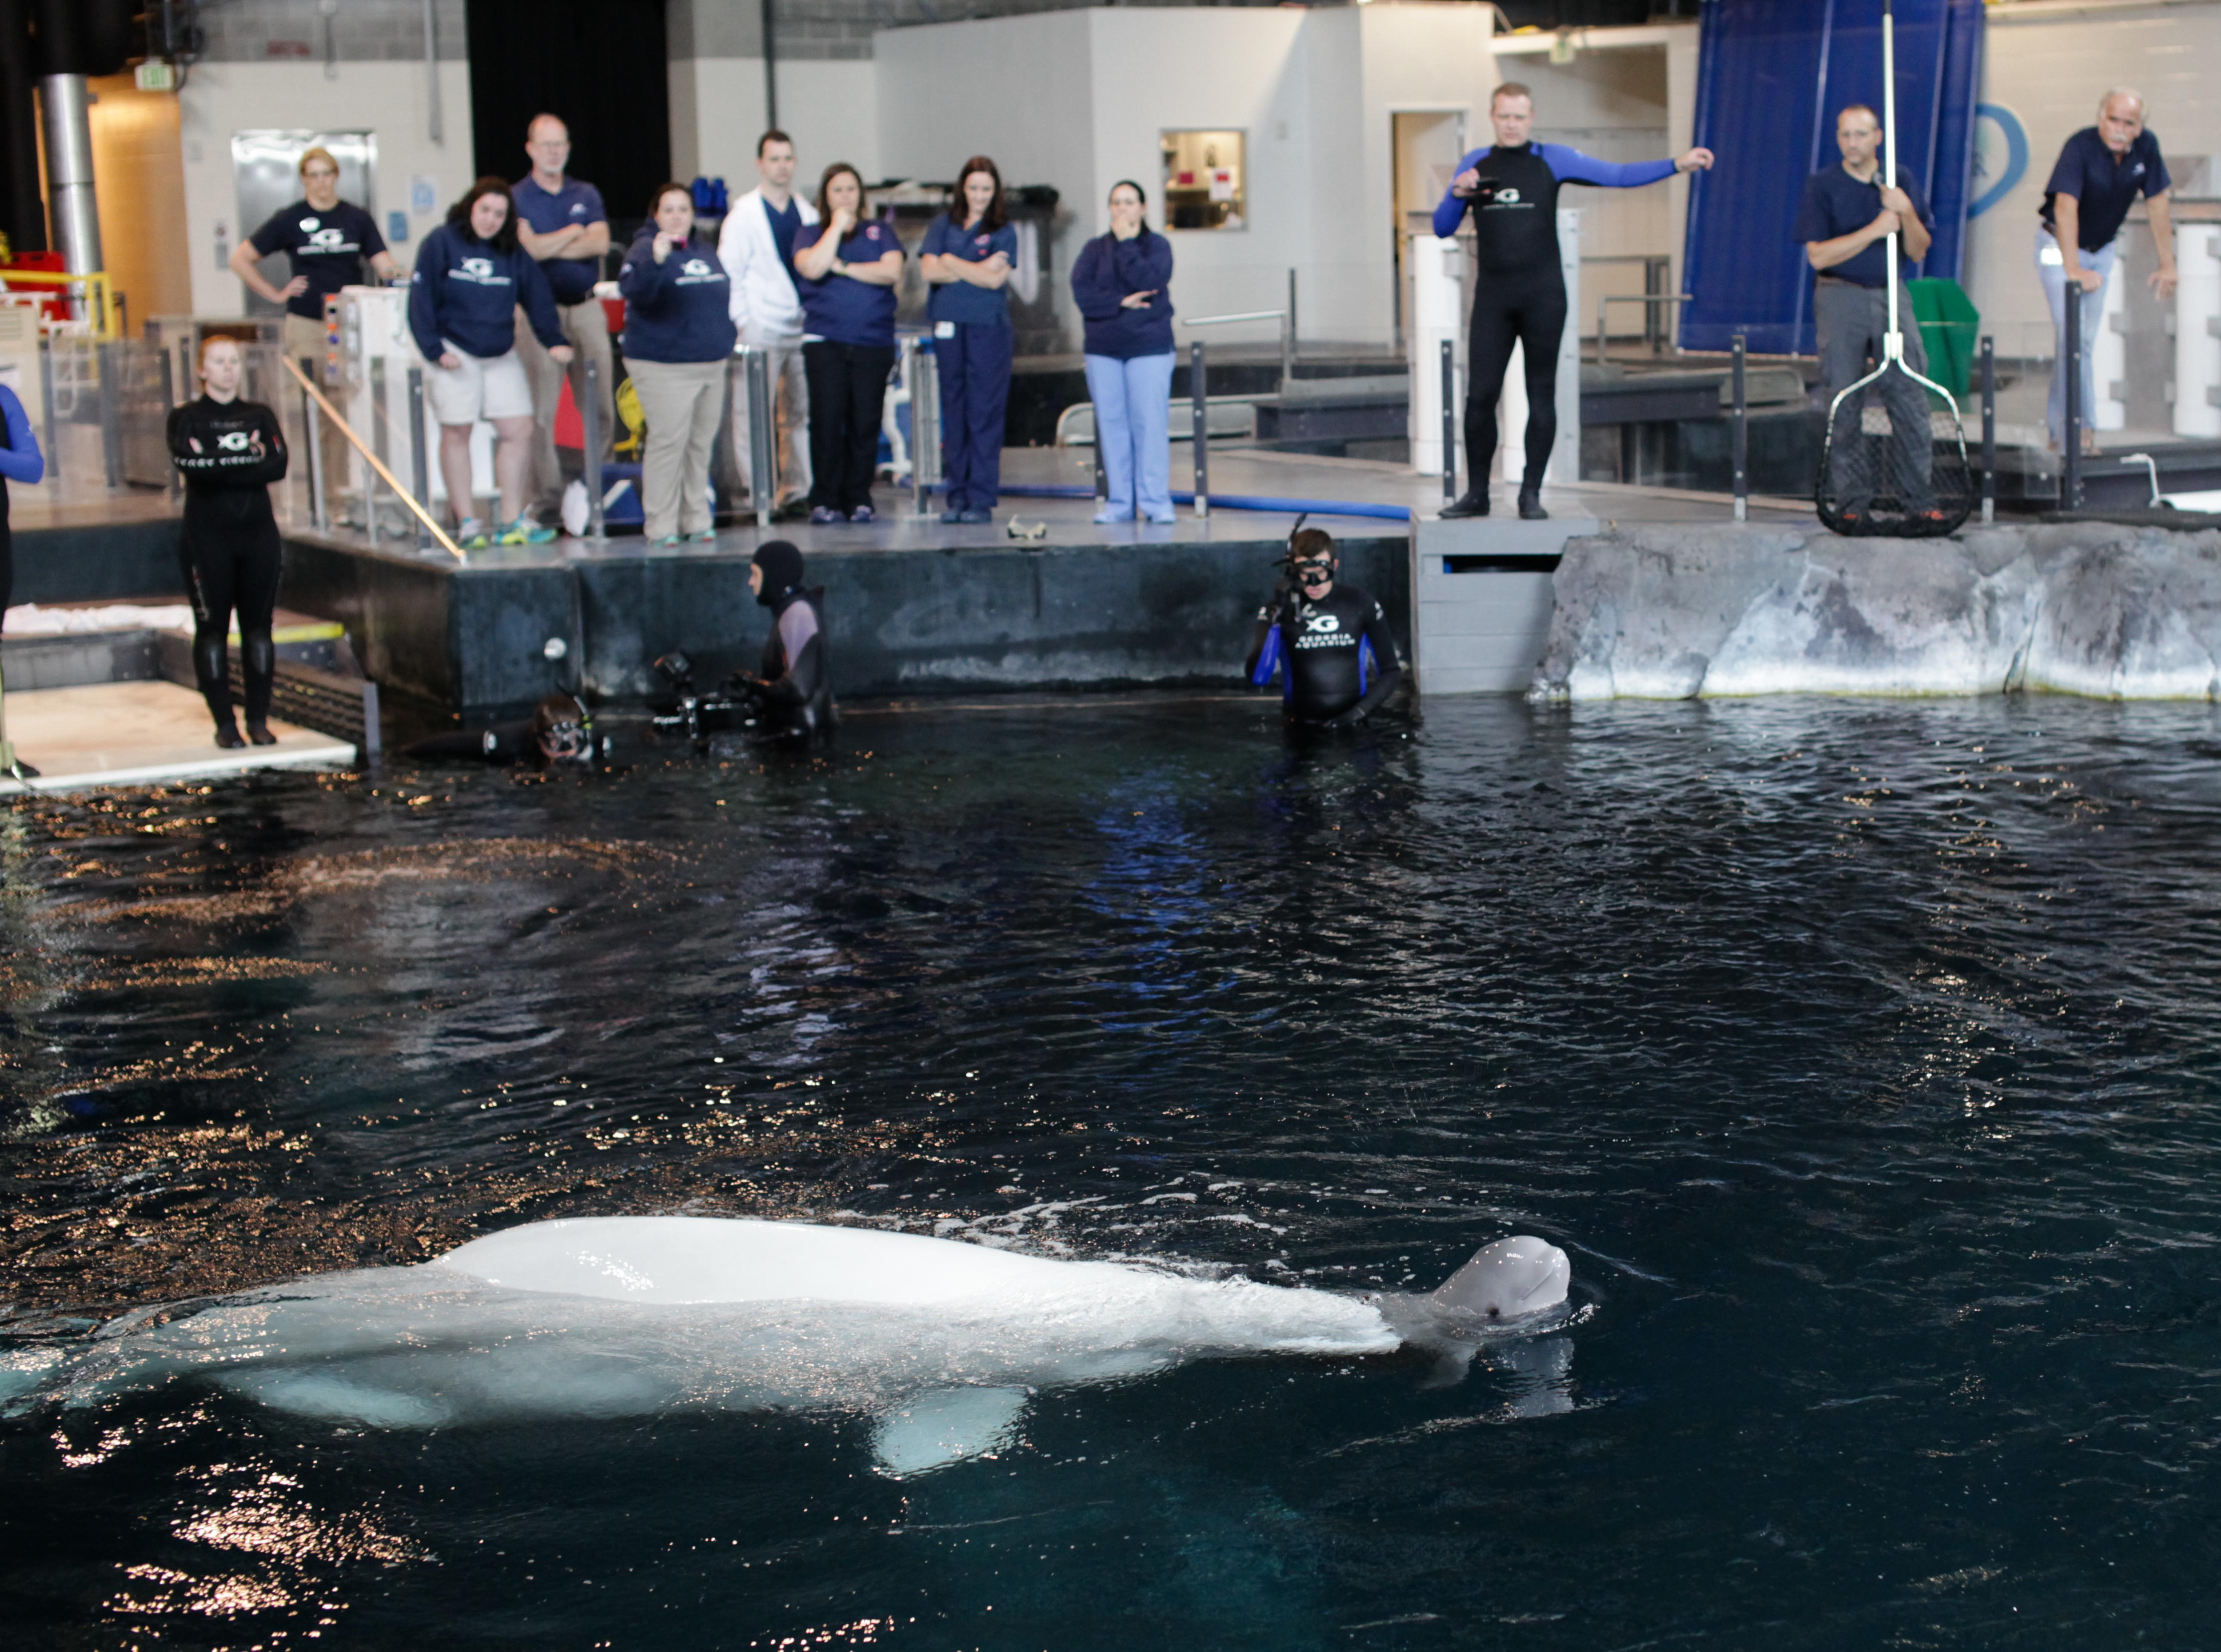 Georgia Aquarium Welcomes Female Beluga Whale Calf On